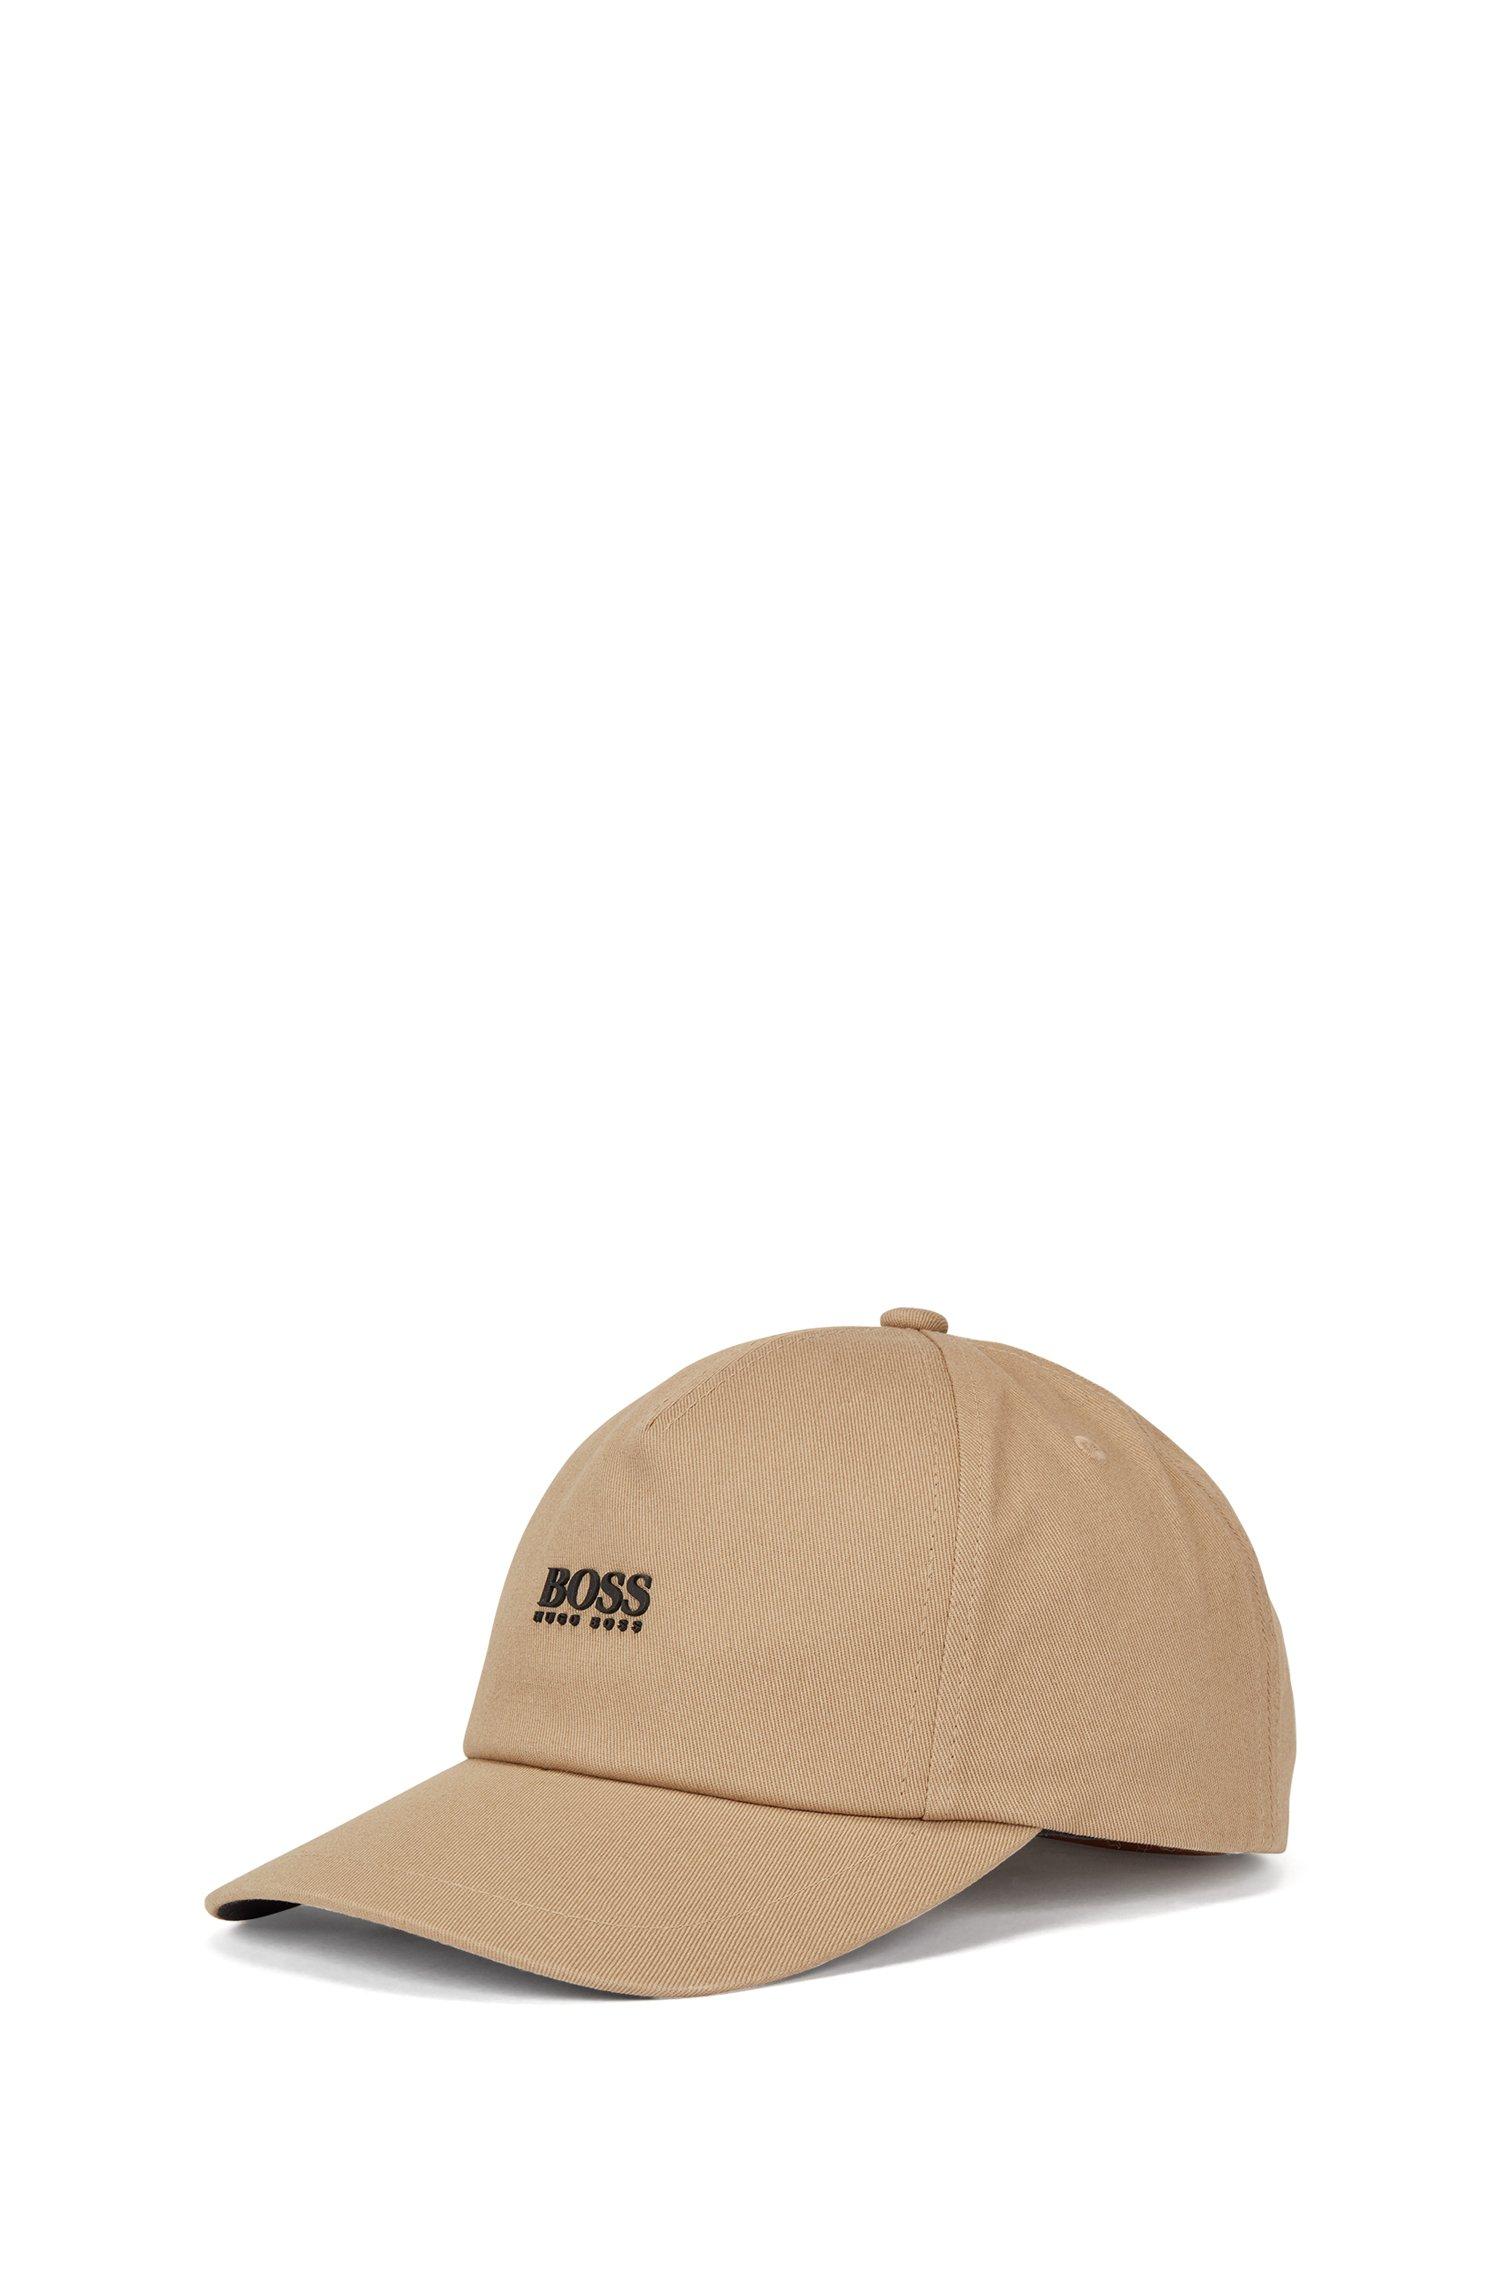 Cotton-twill cap with high-definition logo print, Beige